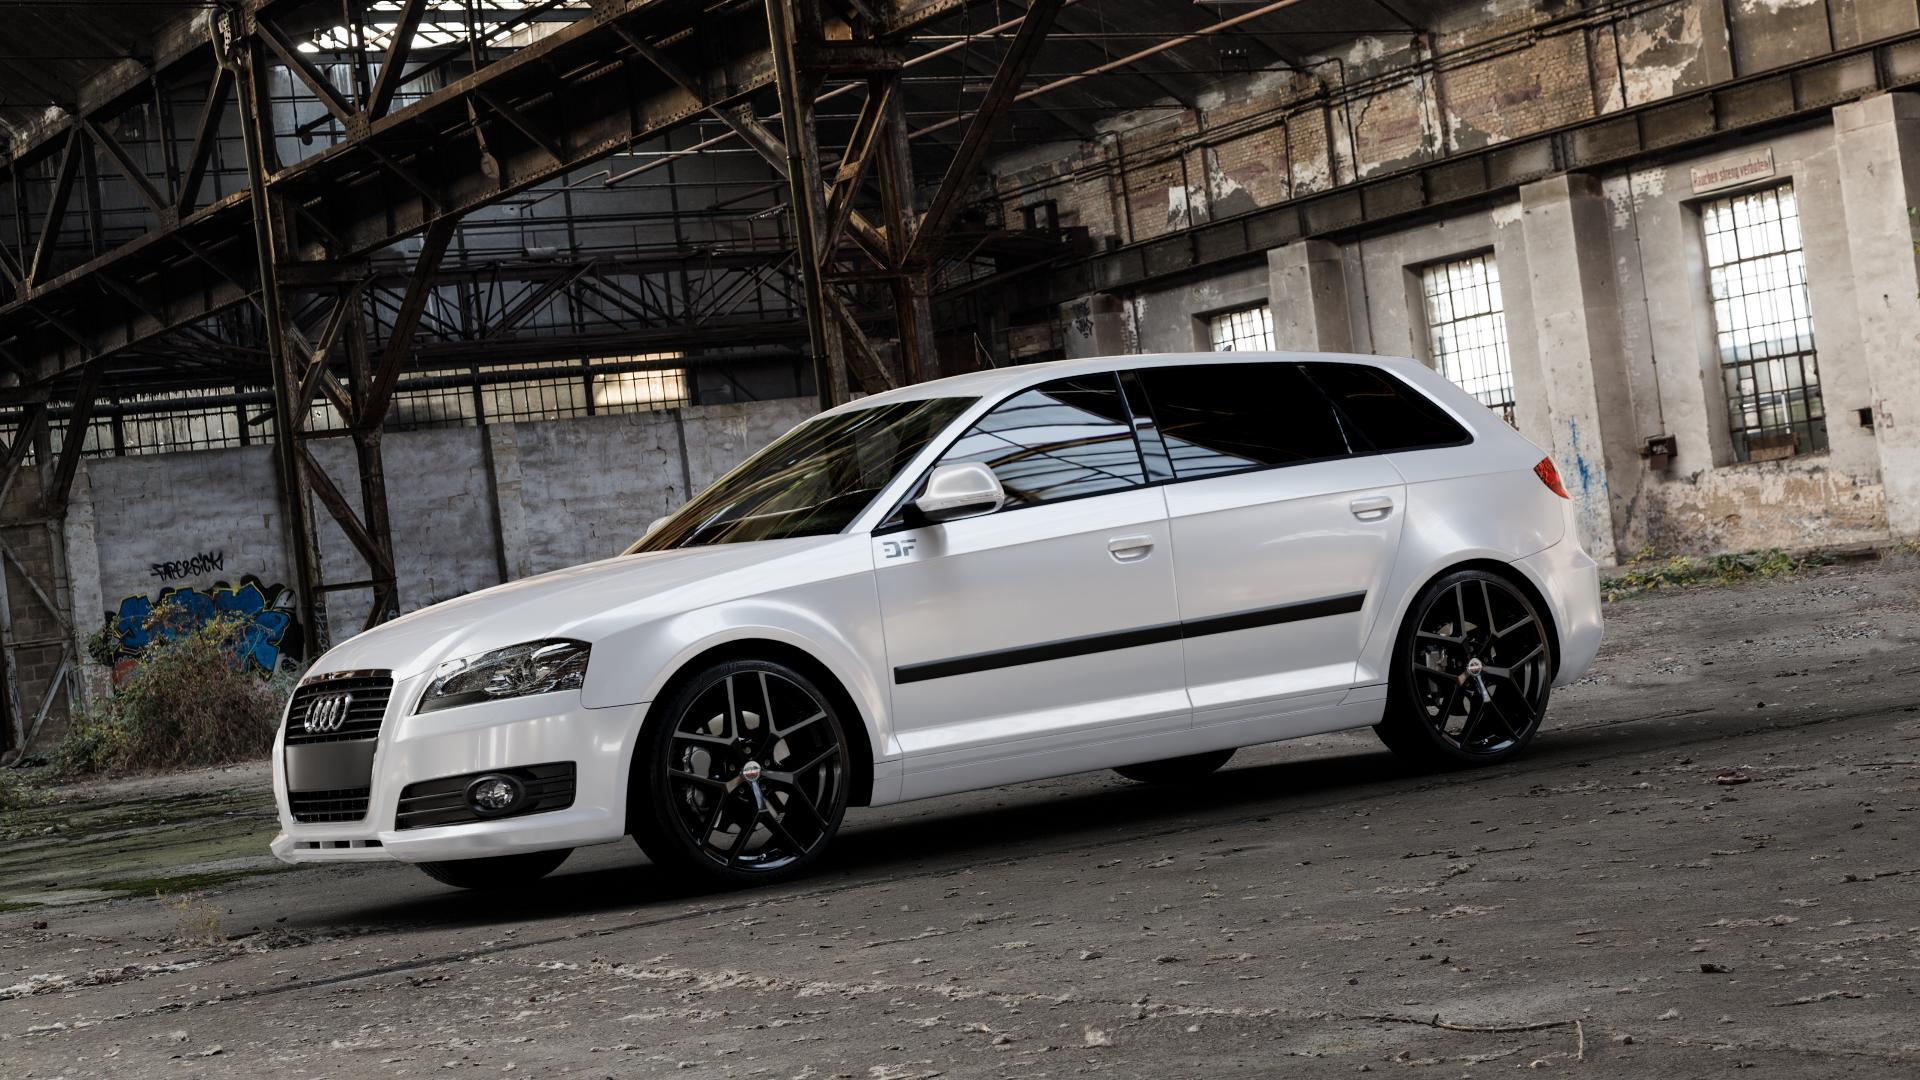 Borbet Y black glossy Felge mit Reifen schwarz in 19Zoll Winterfelge Alufelge auf weissem Audi A3 Typ 8P (Sportback) 1,6l 75kW (102 PS) 2,0l FSI 110kW (150 1,9l TDI 77kW (105 103kW (140 TFSI 147kW (200 85kW (116 100kW (136 1,8l 118kW (160 125kW (170 1,4l 92kW (125 120kW (163 quattro 3,2l V6 184kW (250 S3 195kW (265 1,2l 66kW (90 18